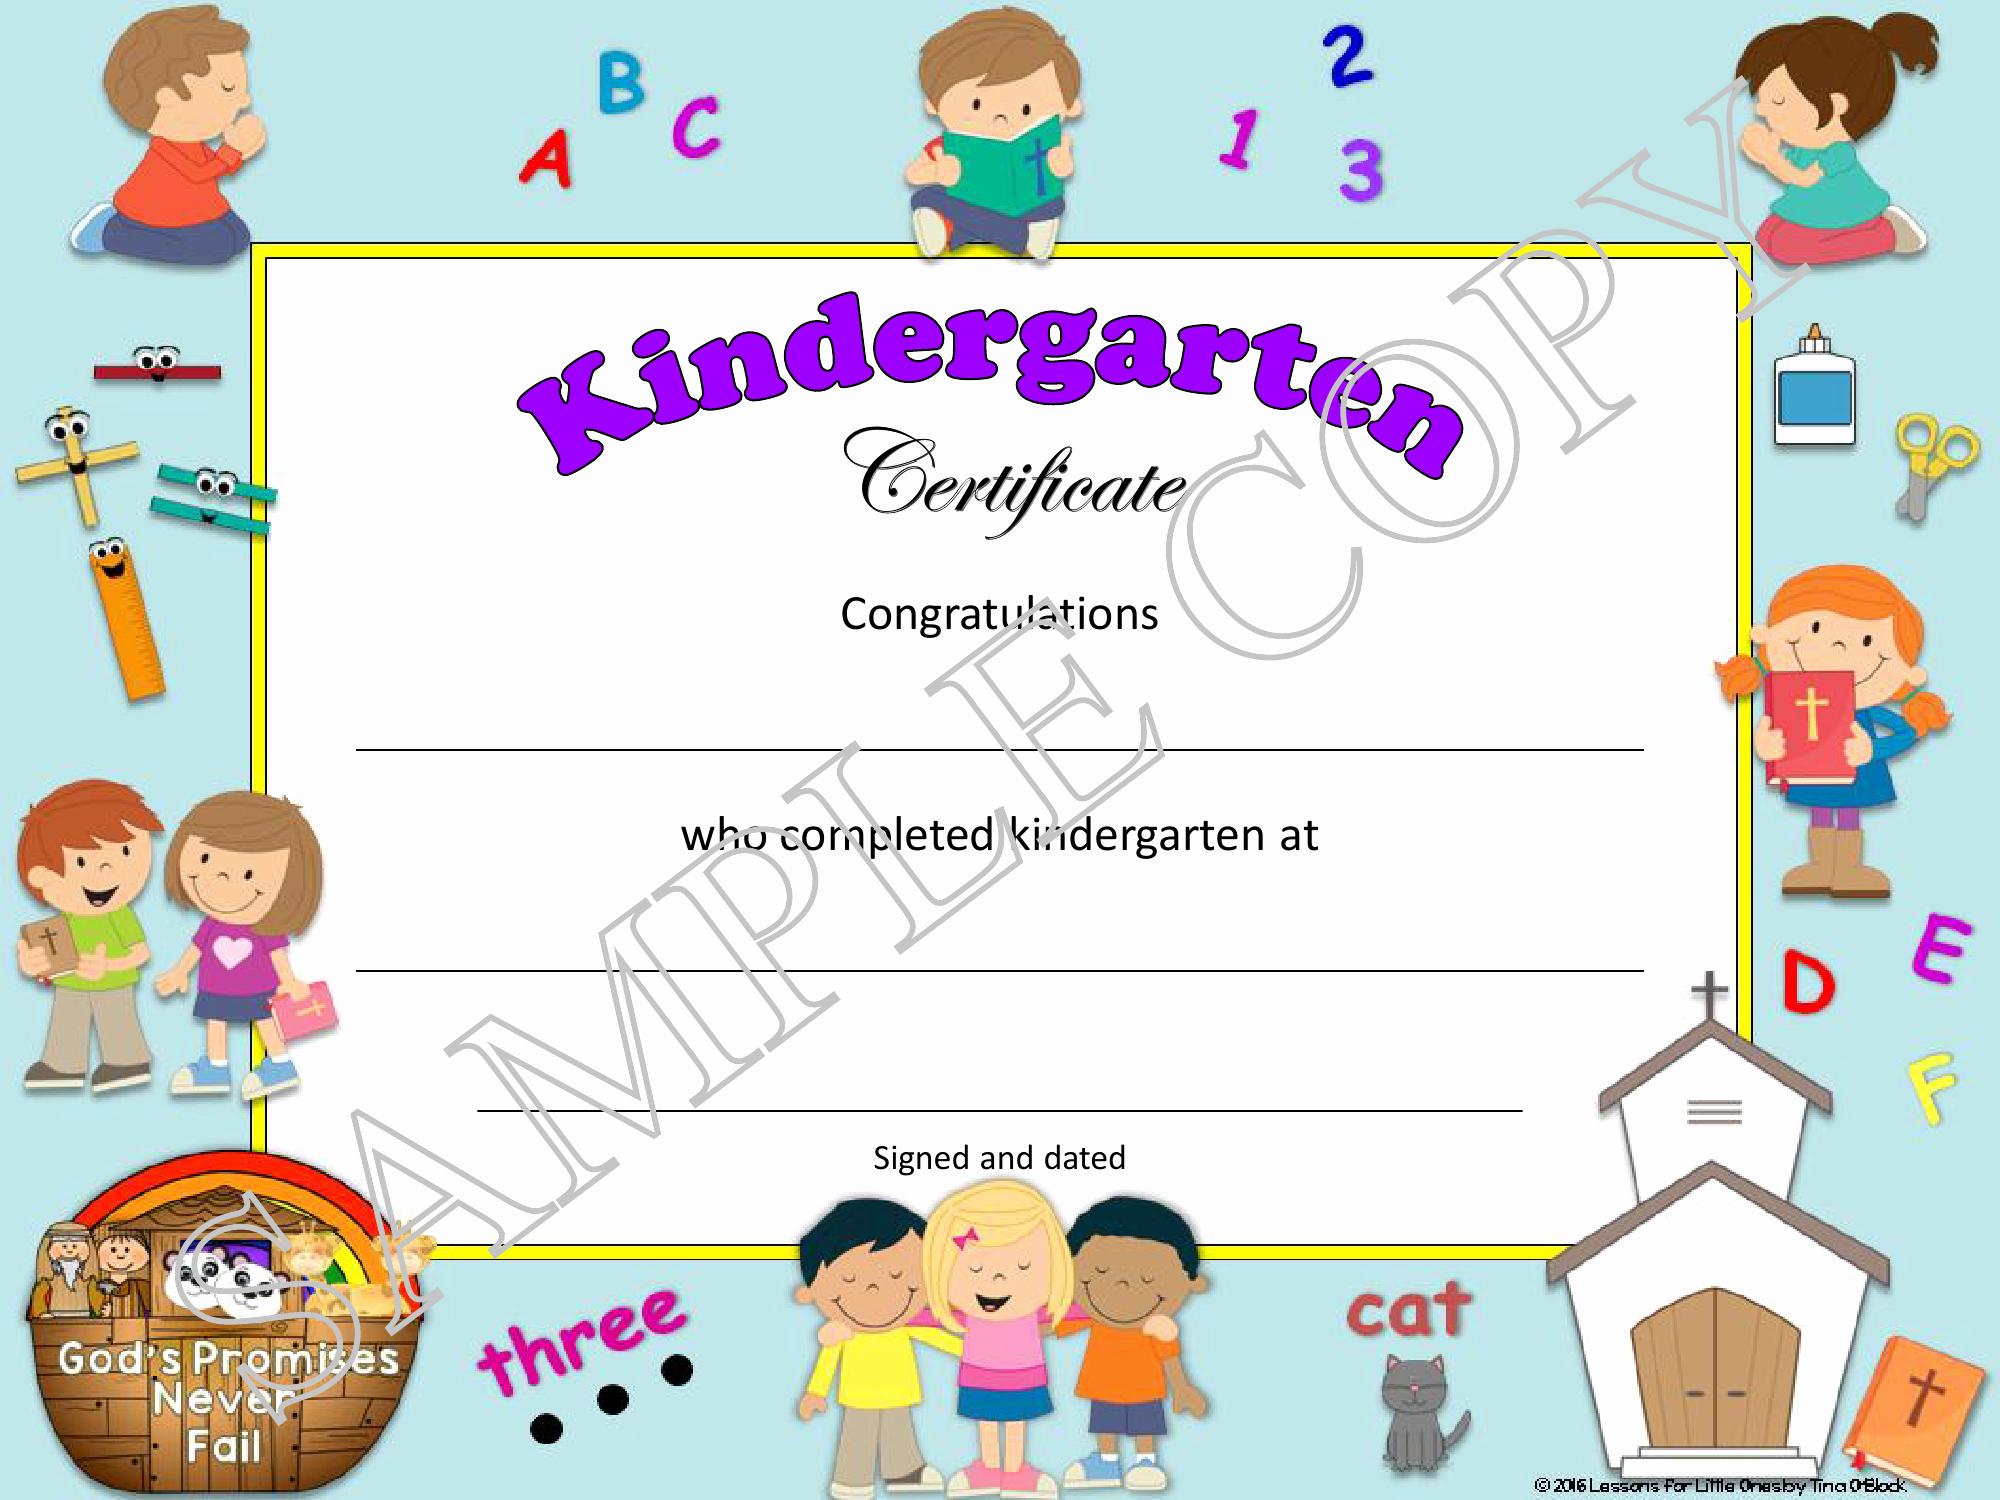 Preschool Graduation Certificate Free Printable Fresh Christian Religious Diplomas for Preschool – Grade 6